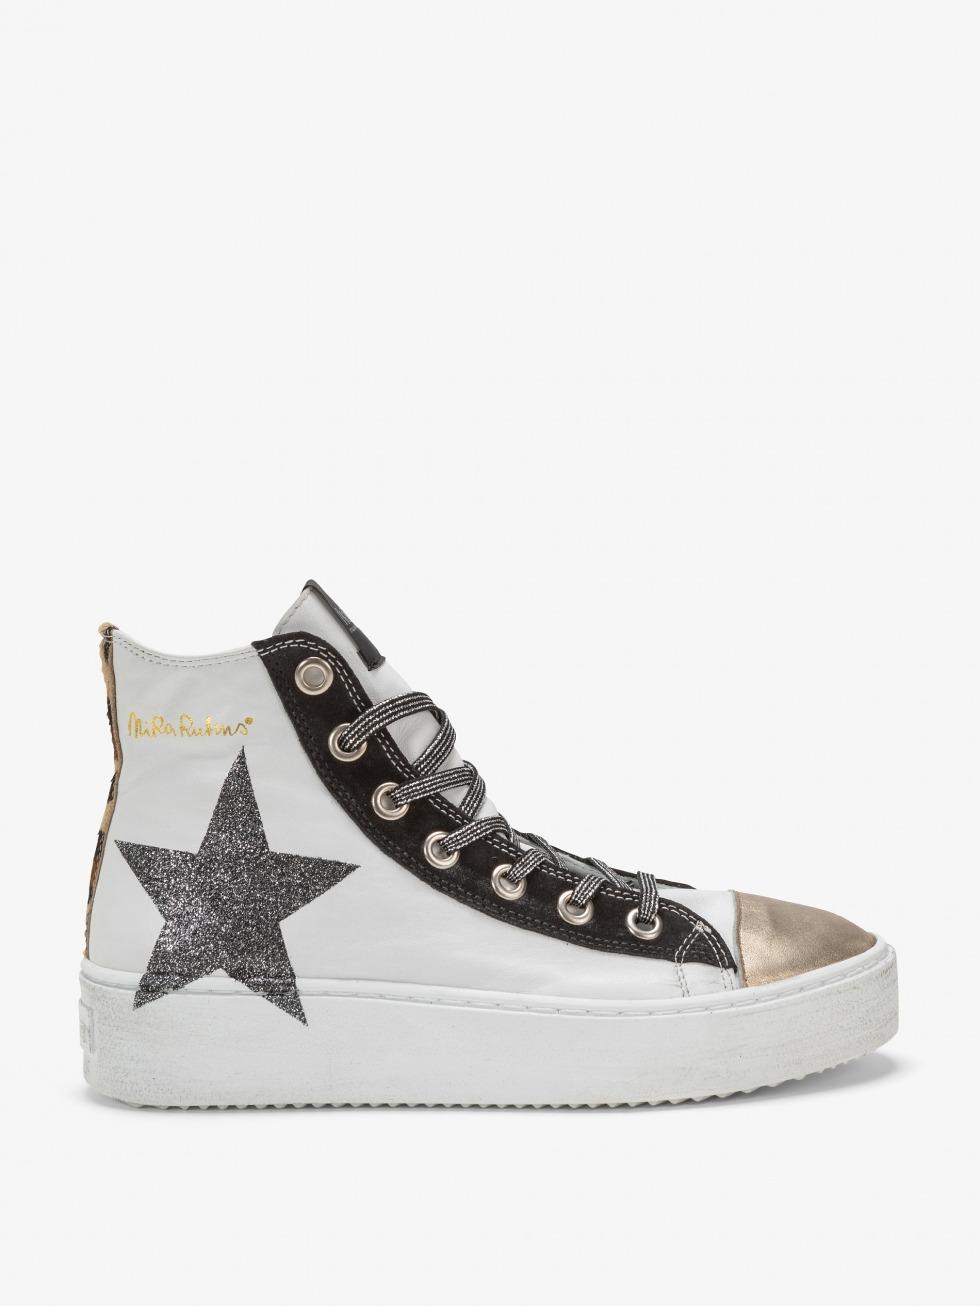 Long Island Sneakers - Gold Leo Glitter Star